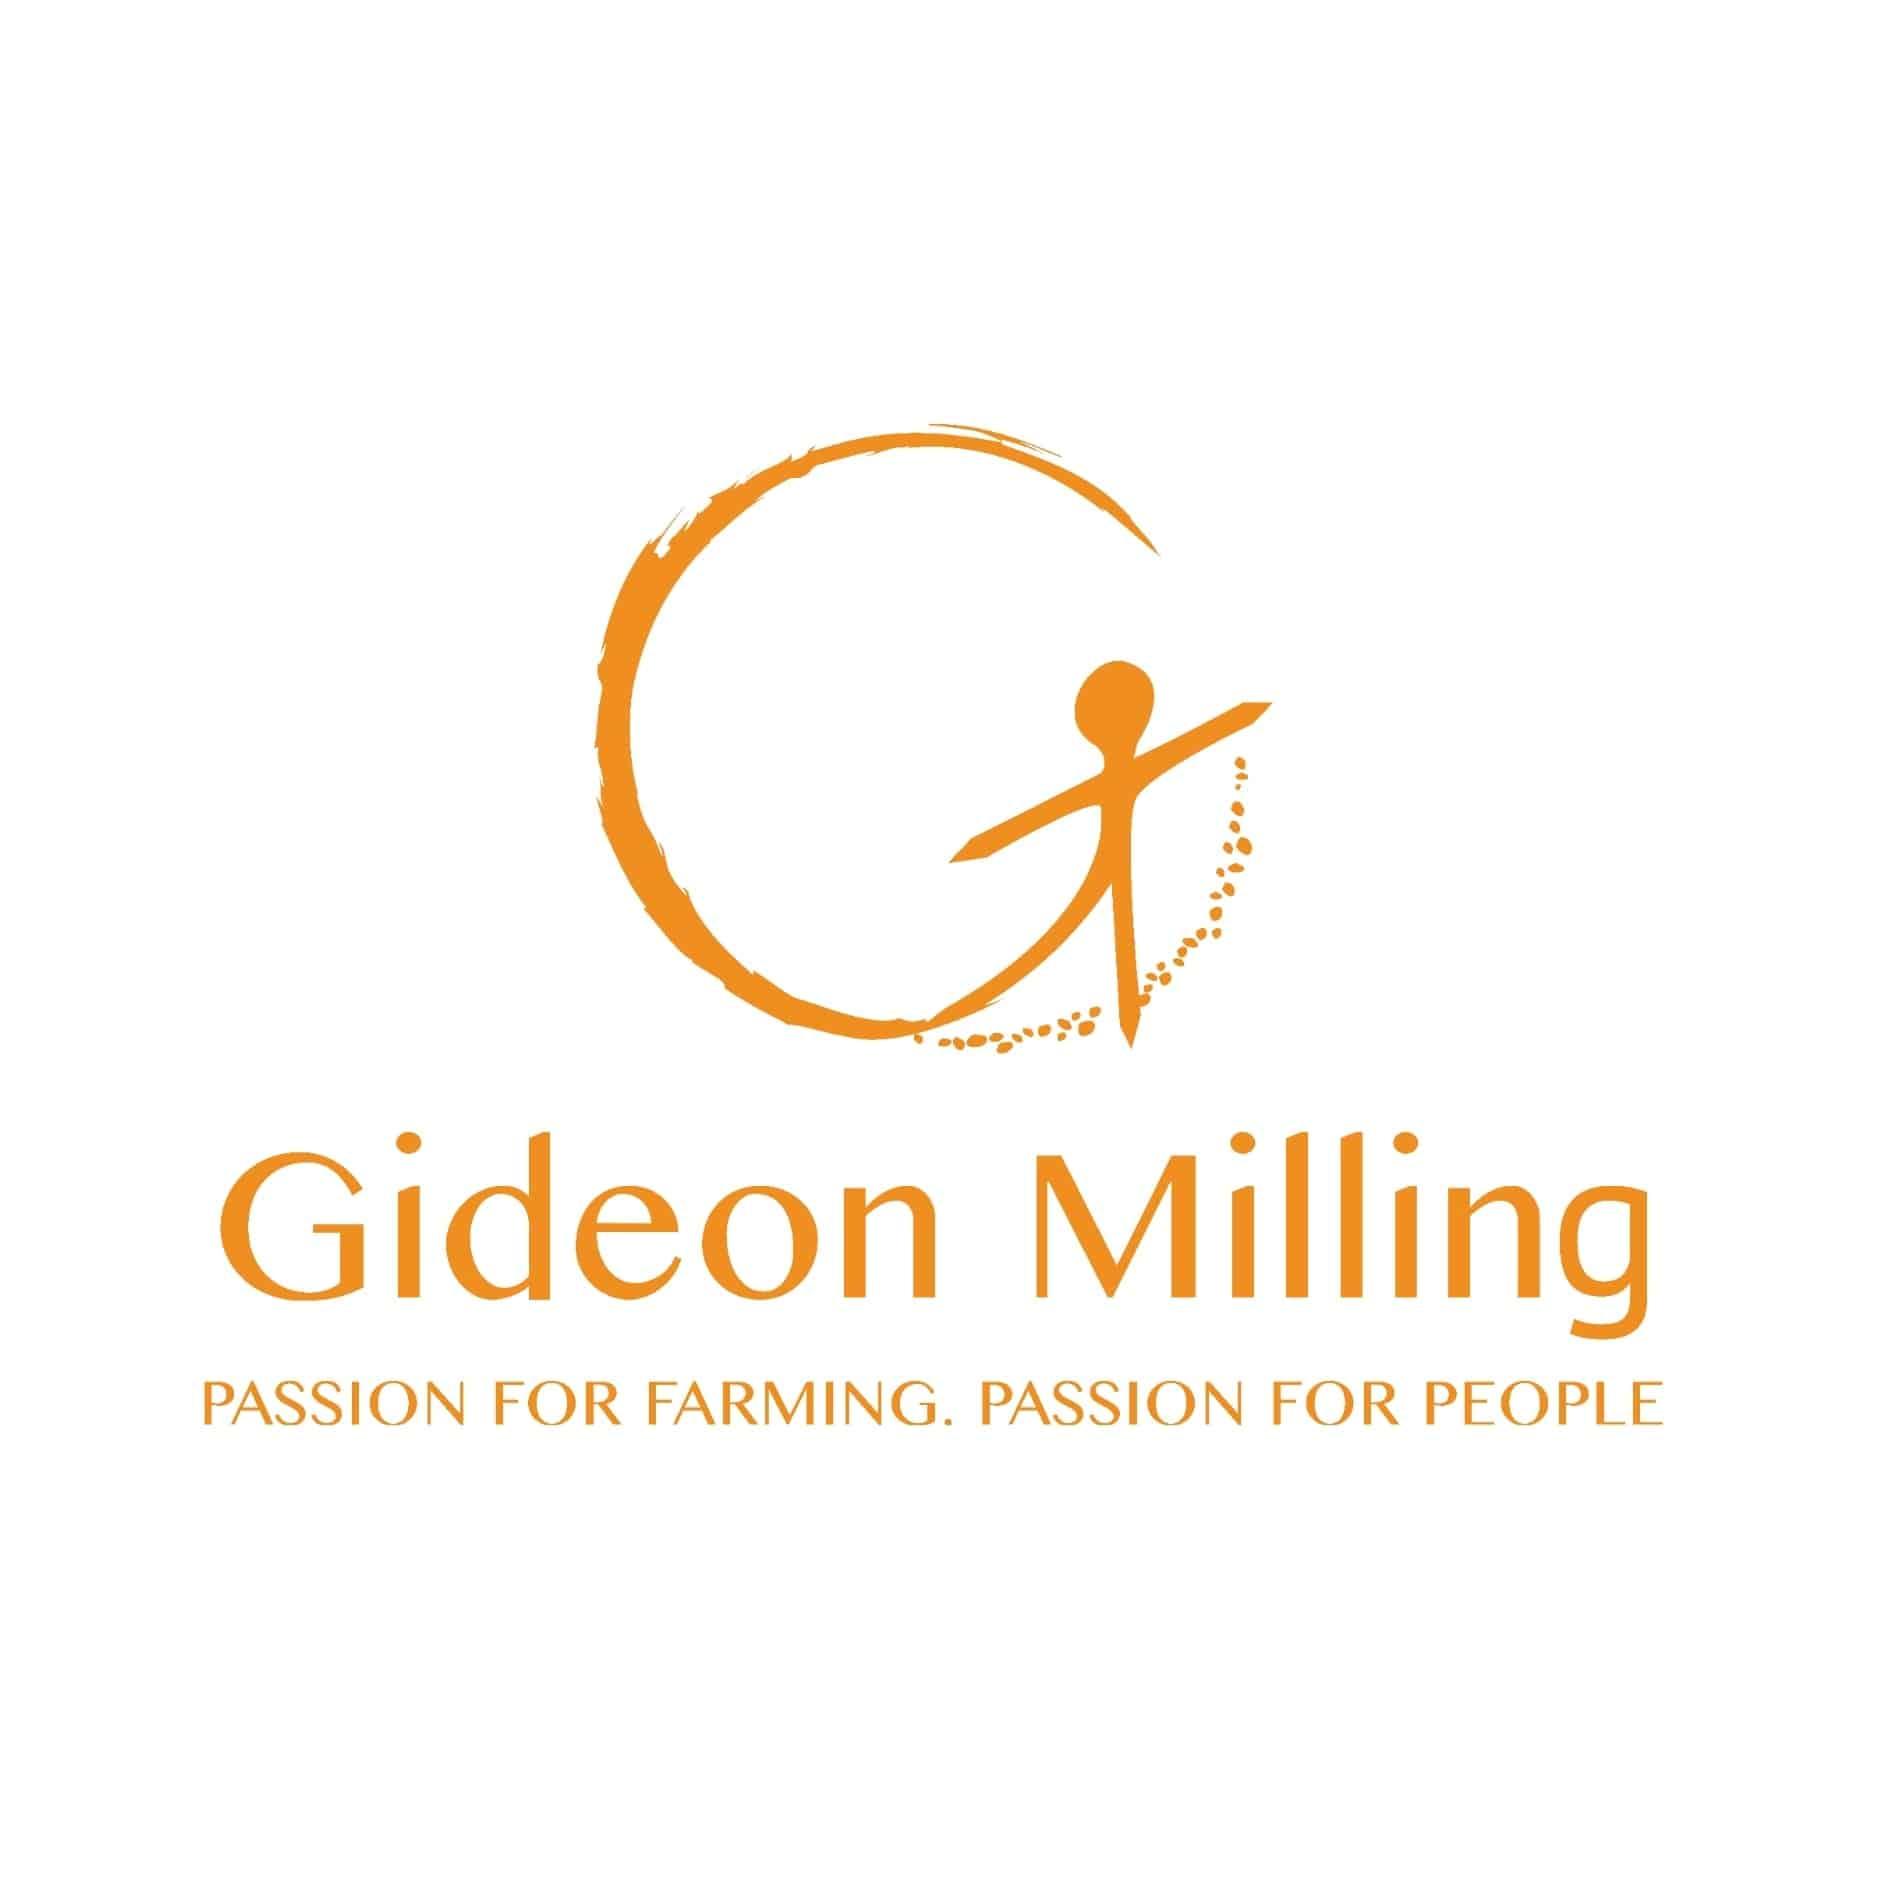 Gideon Milling